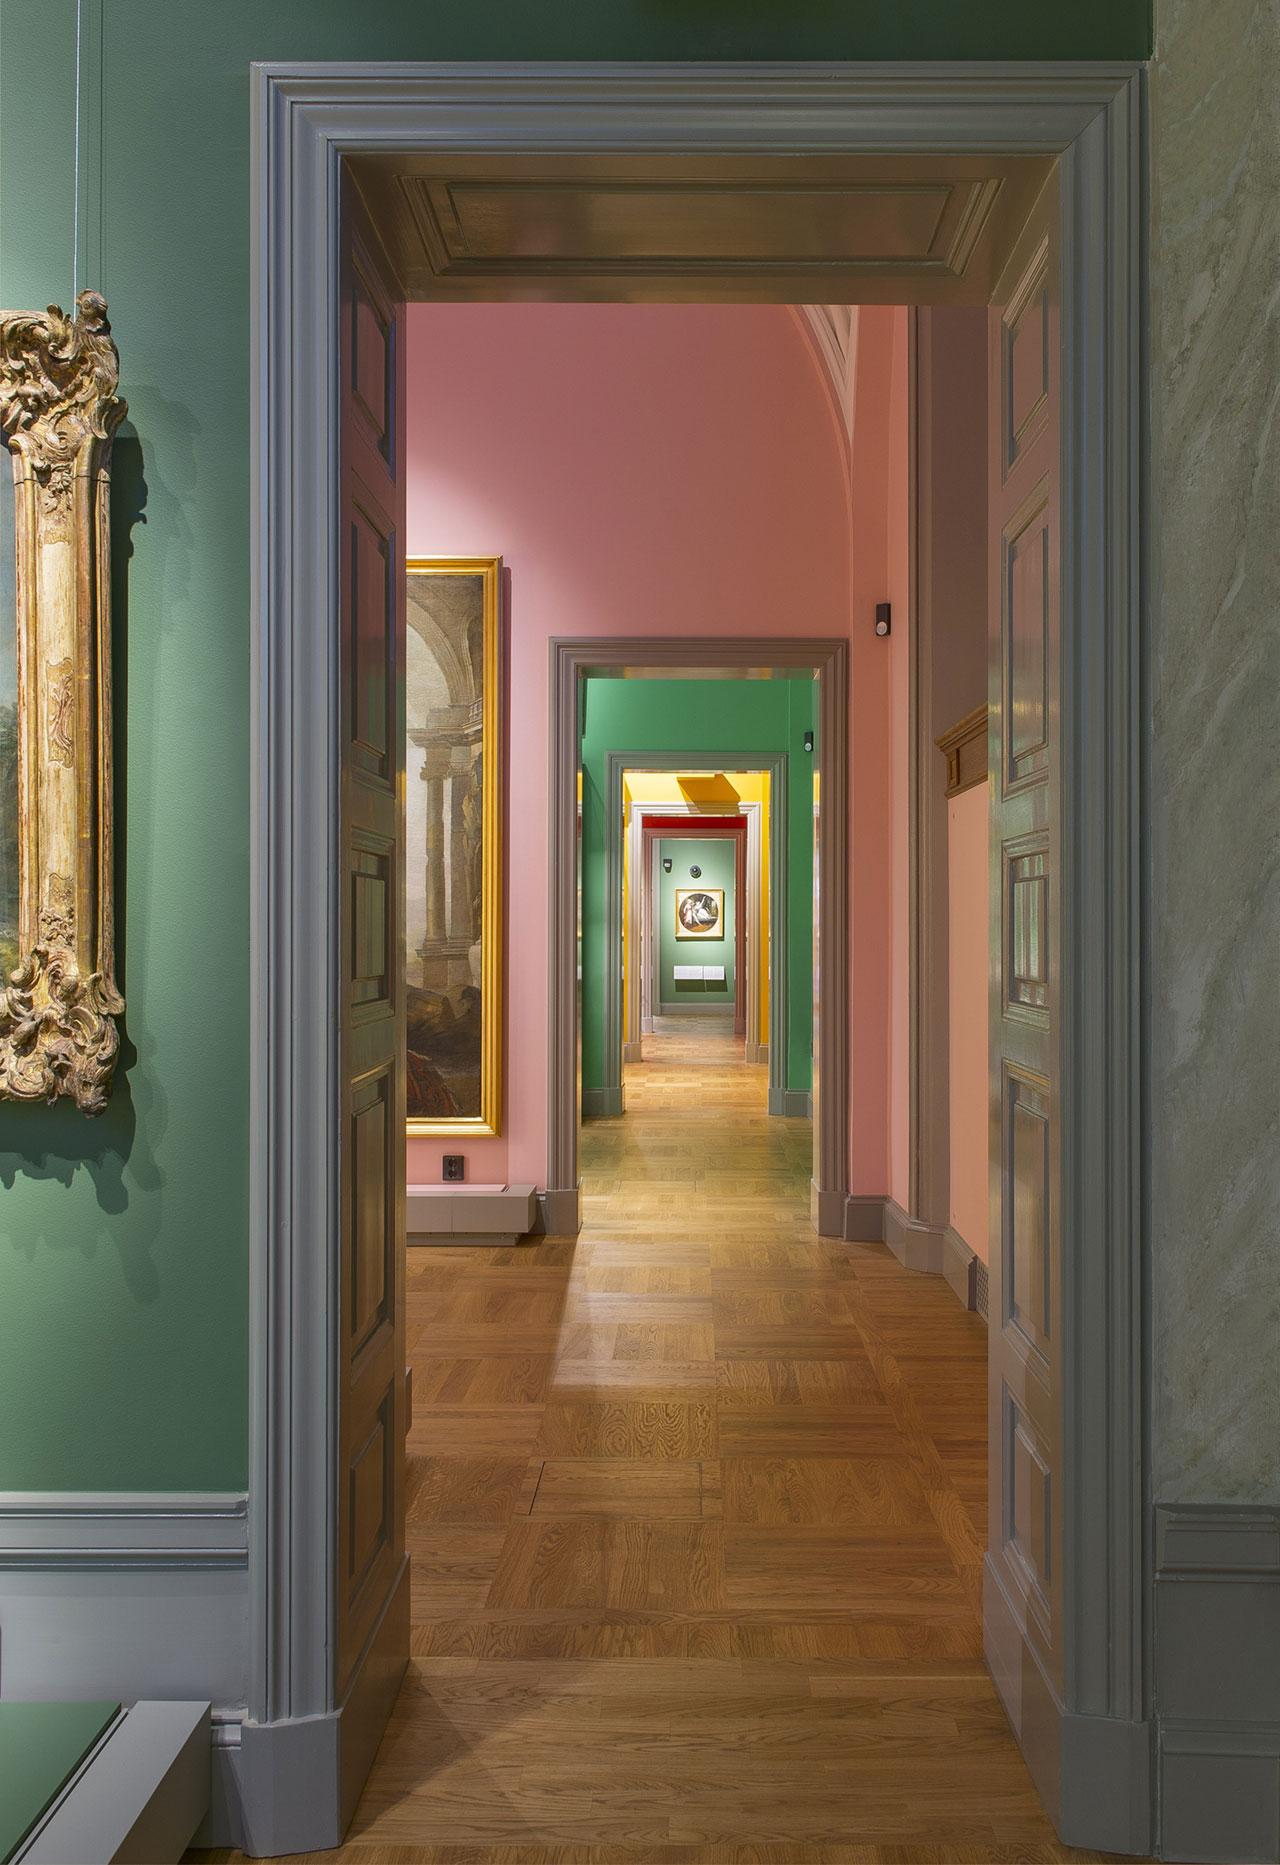 Nationalmuseum interior view.Photo ©Nationalmuseum Stockholm.